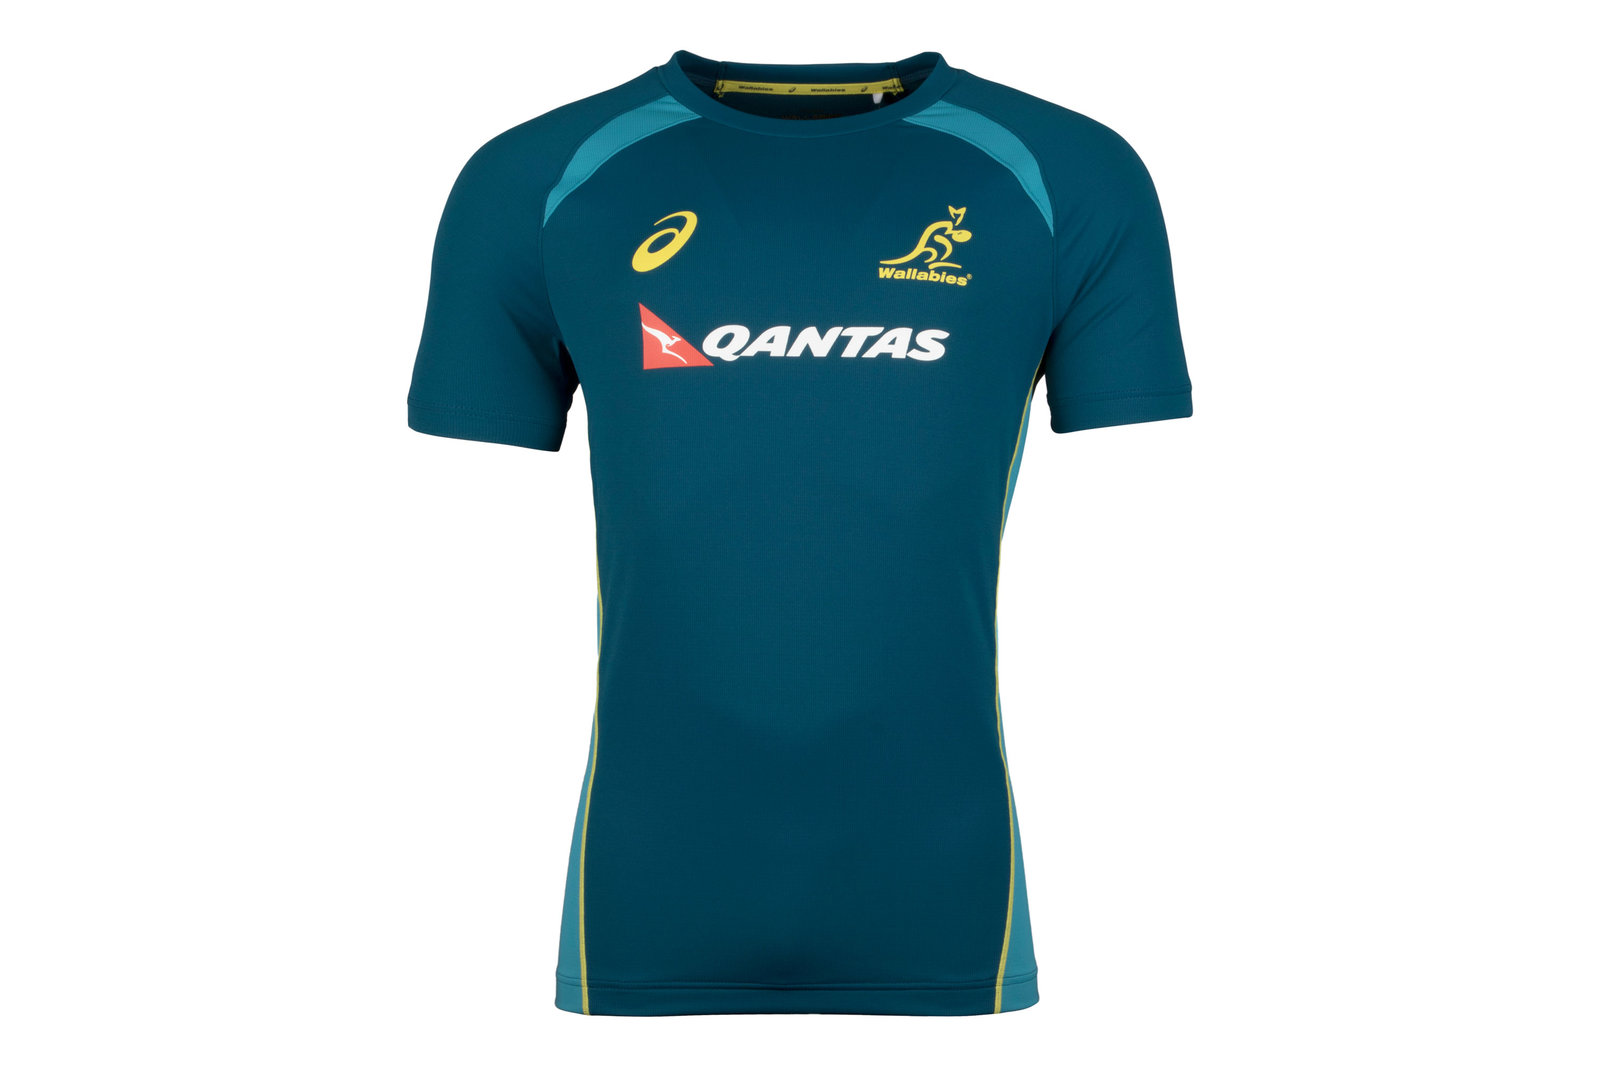 Australia Wallabies 2017/18 Rugby Training Shirt